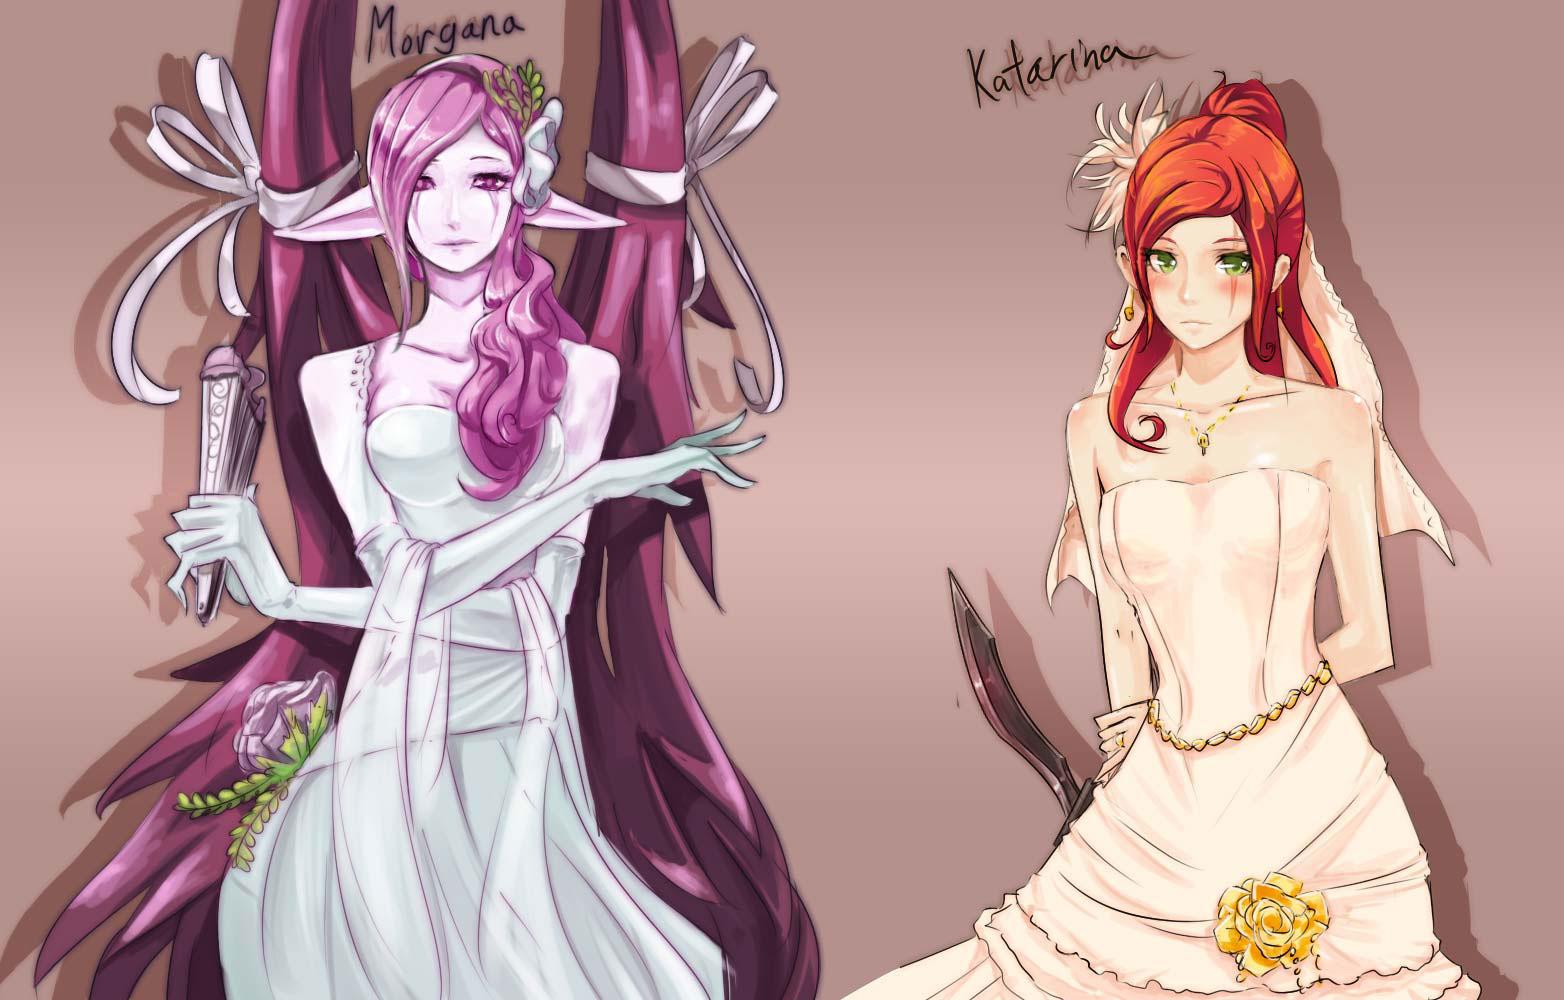 LOL - The Big Day_ Katarina and Morgana by beanbeancurd